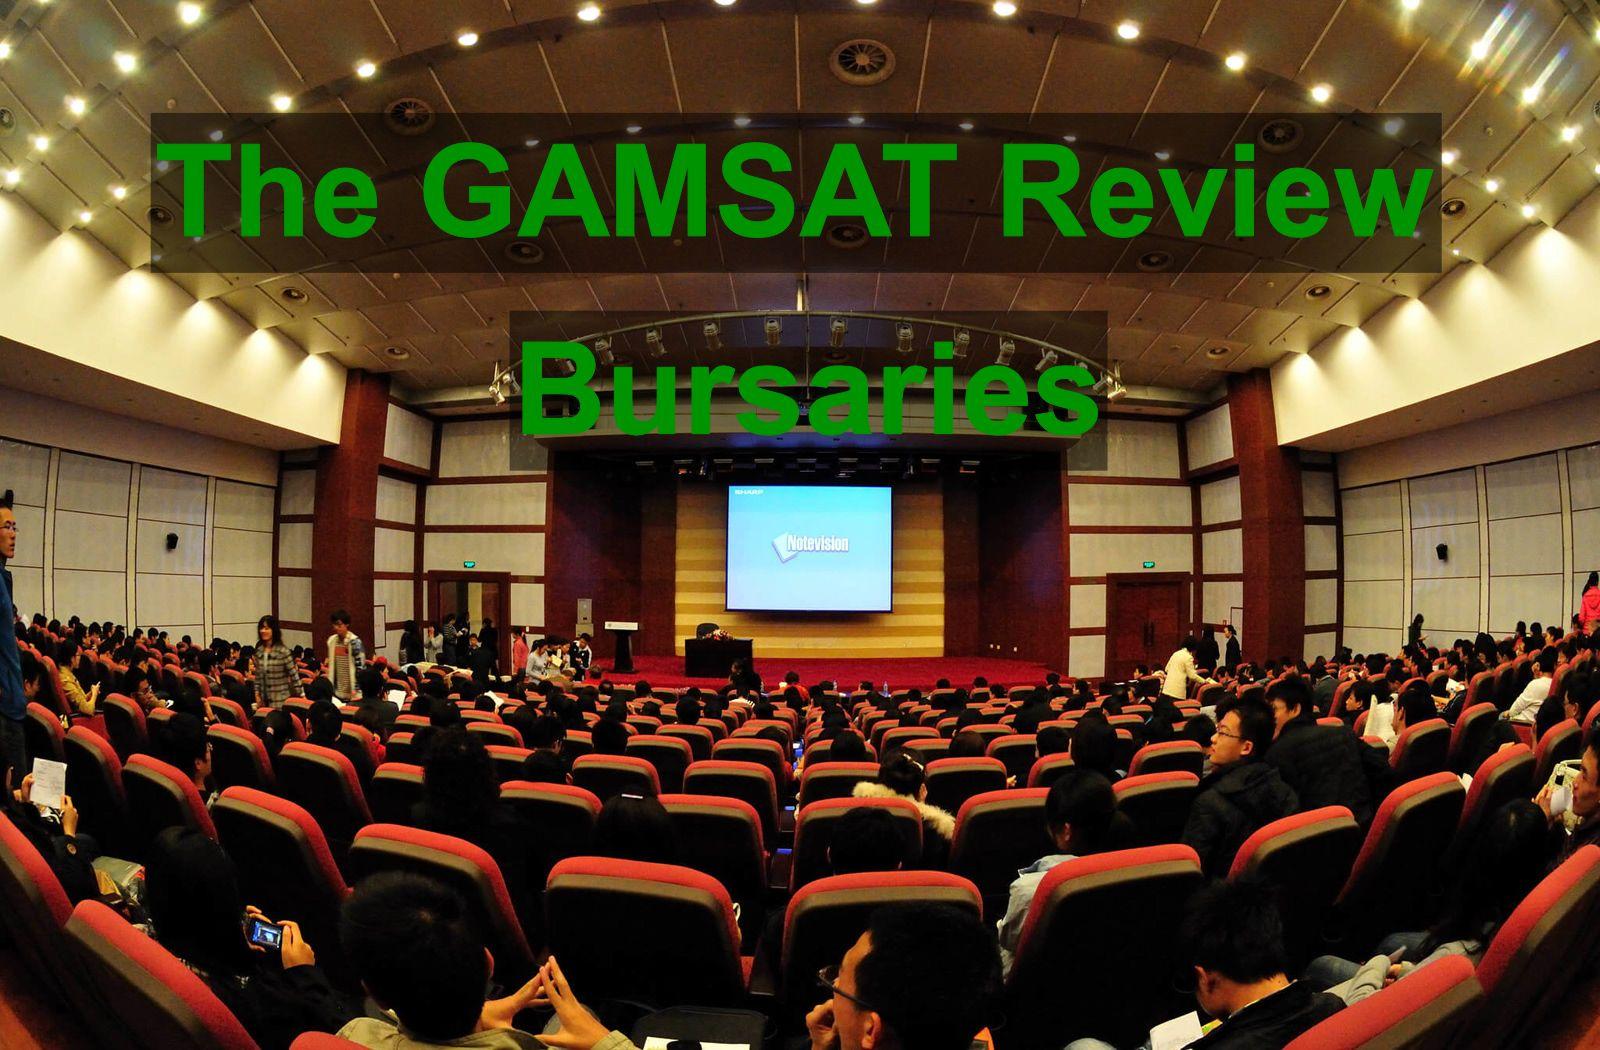 The Gamsat Review Bursary